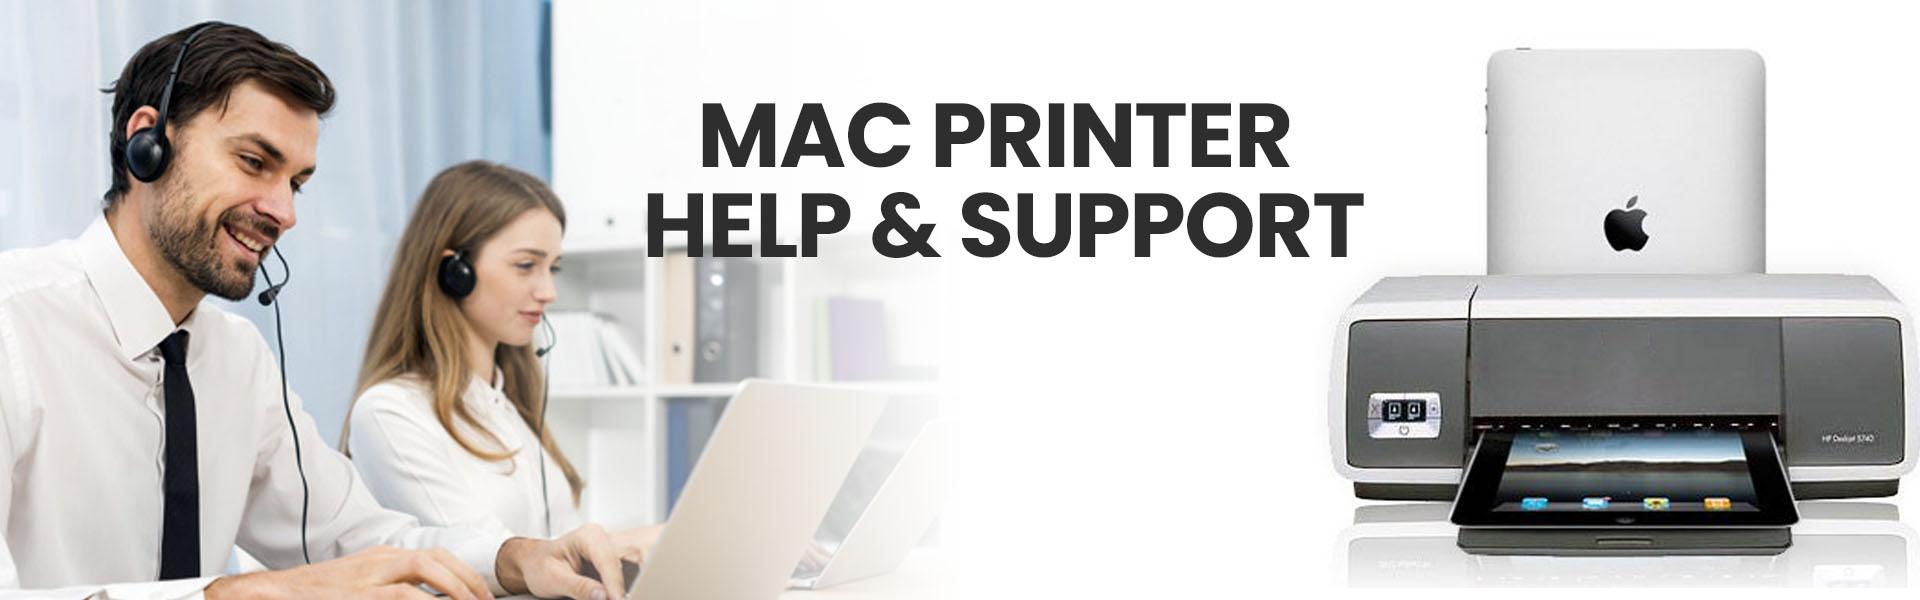 mac printer help support